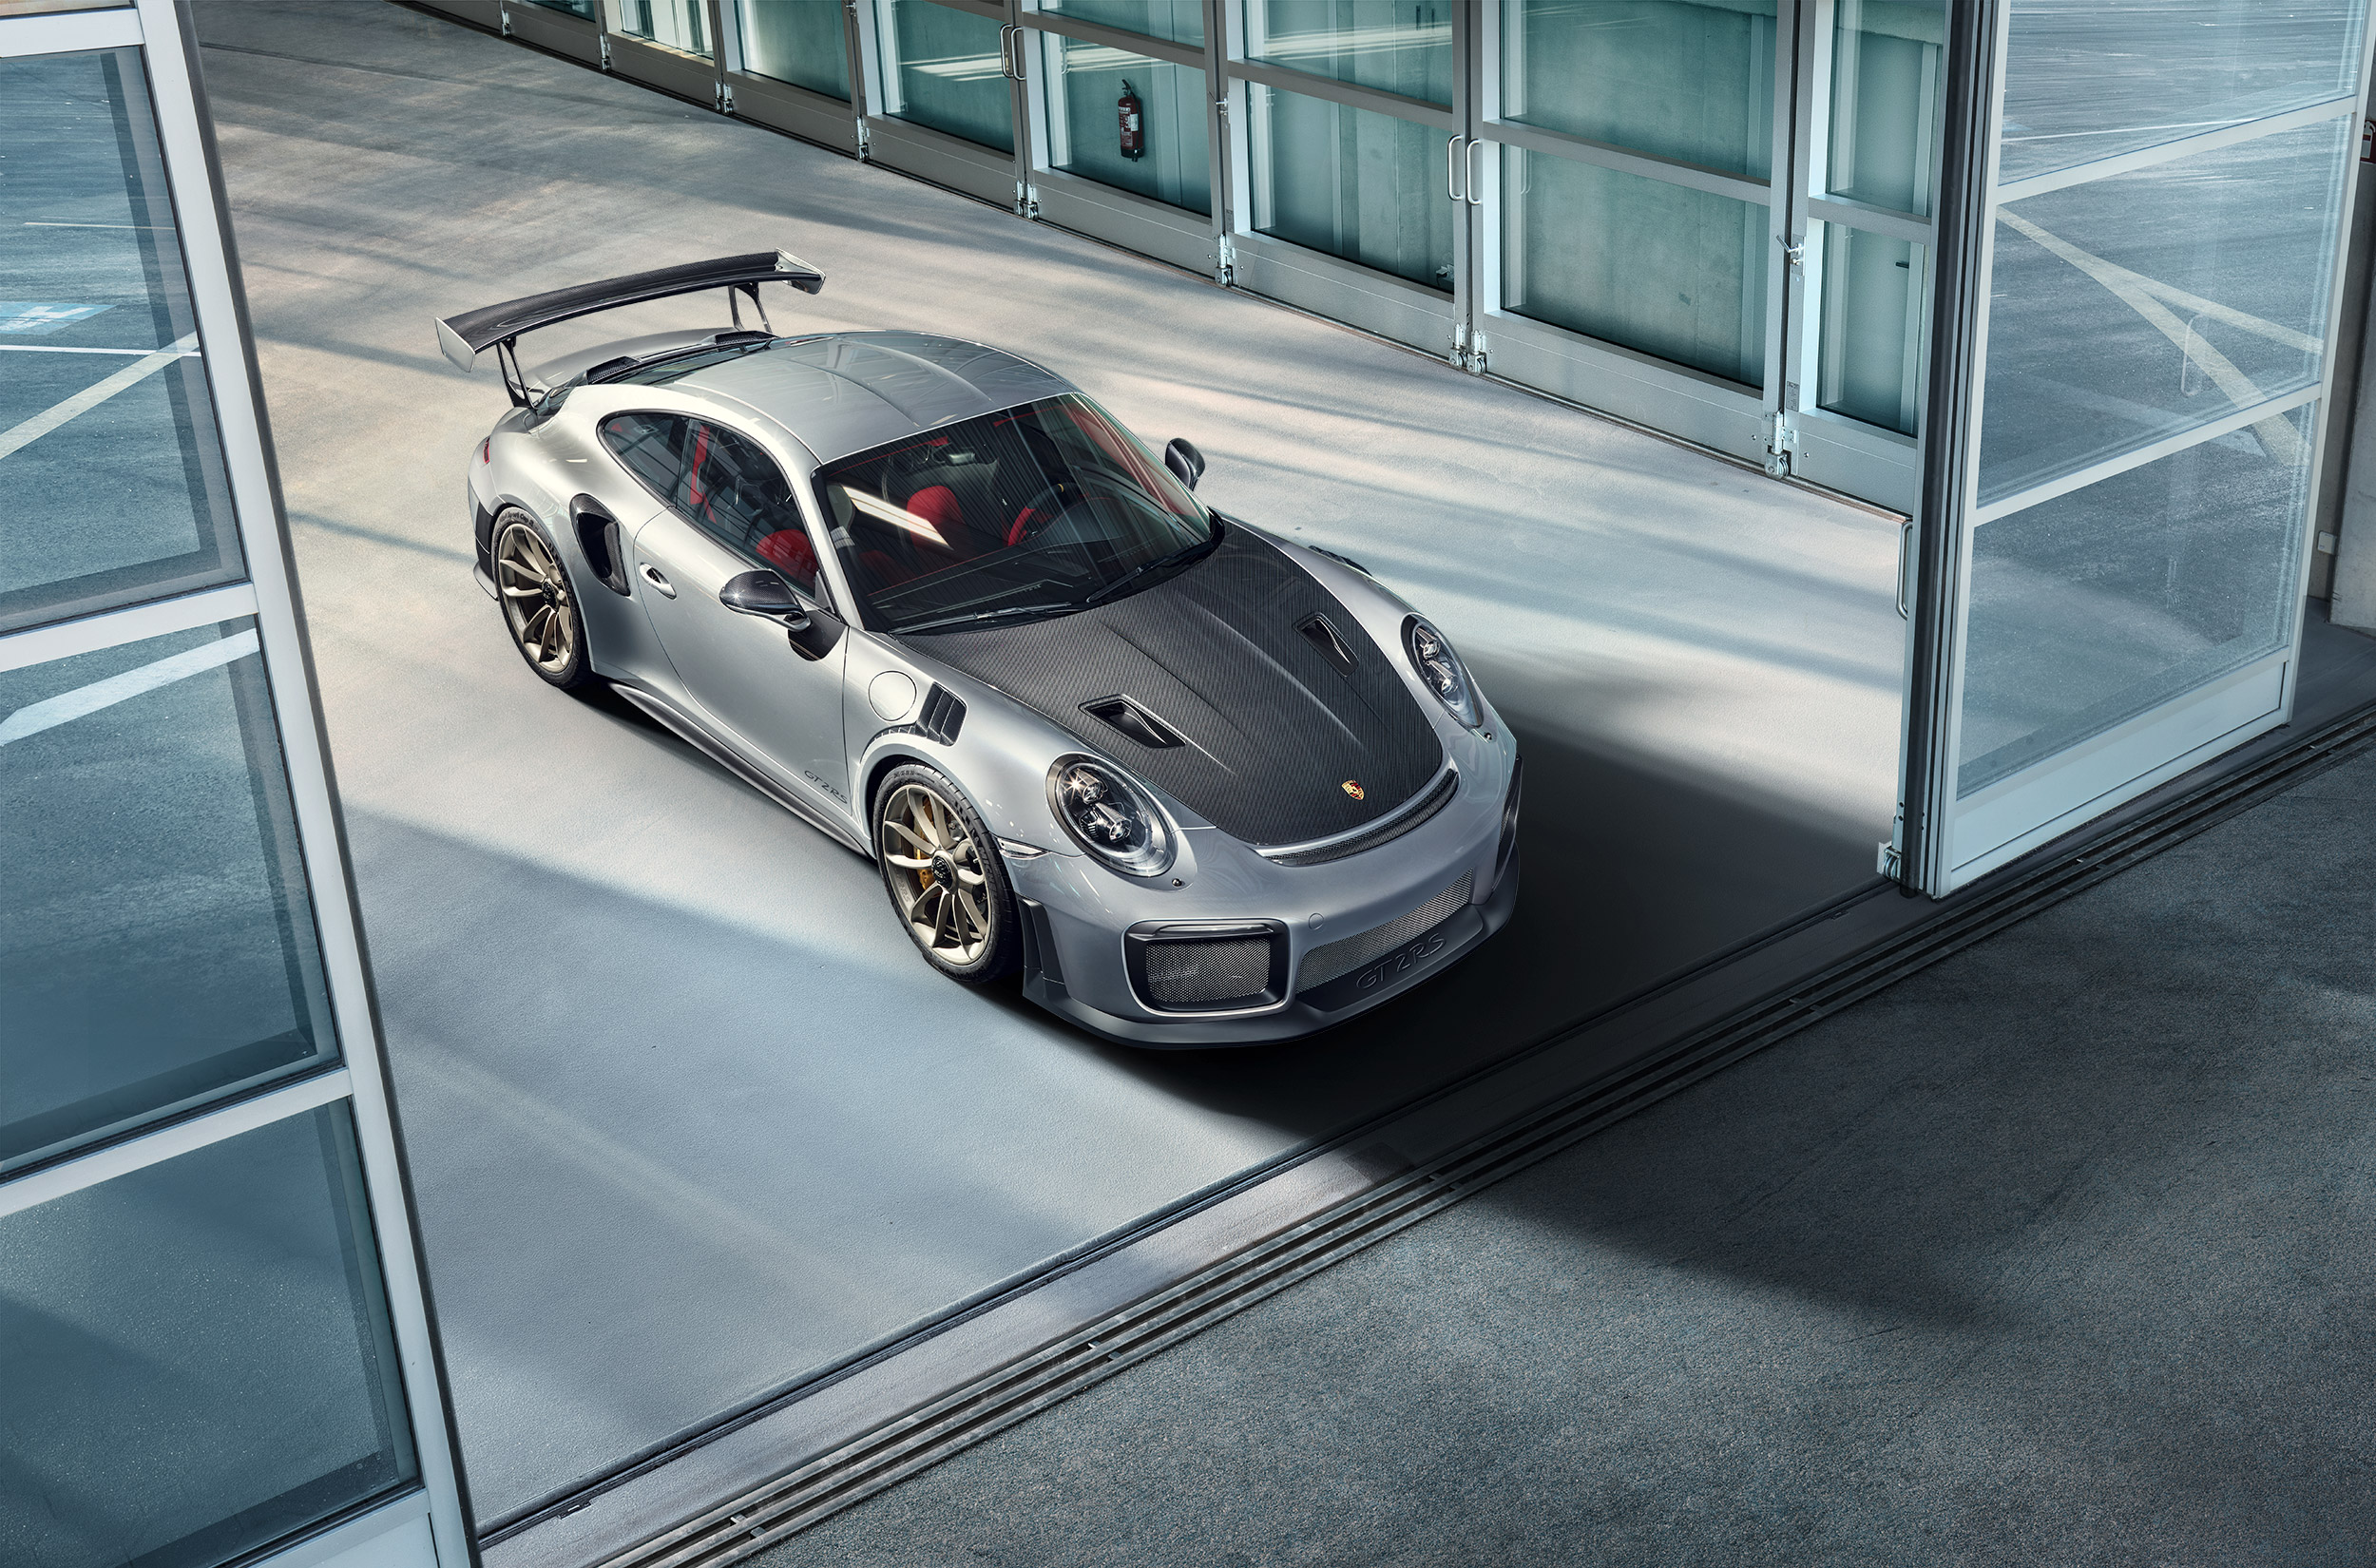 GT2_RS_Front_hoch_2500 Stunning Porsche 911 Gt2 Rs Vs Lamborghini Aventador Cars Trend